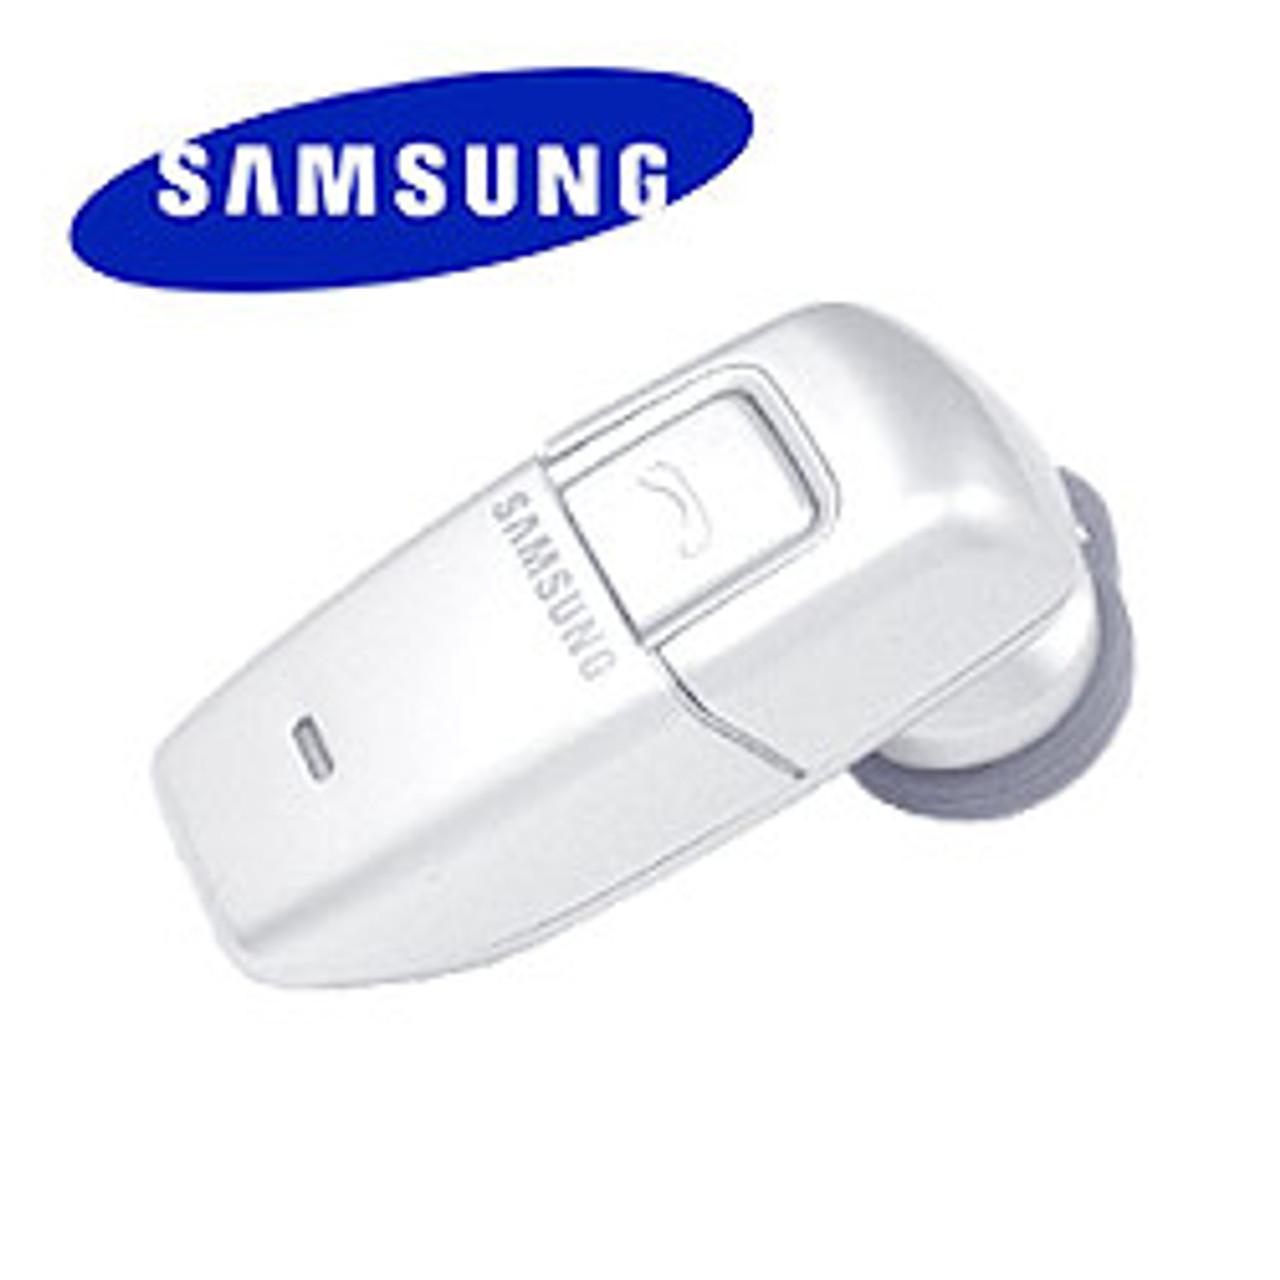 Samsung Wep200 Bluetooth Headset White Esurebuy Com